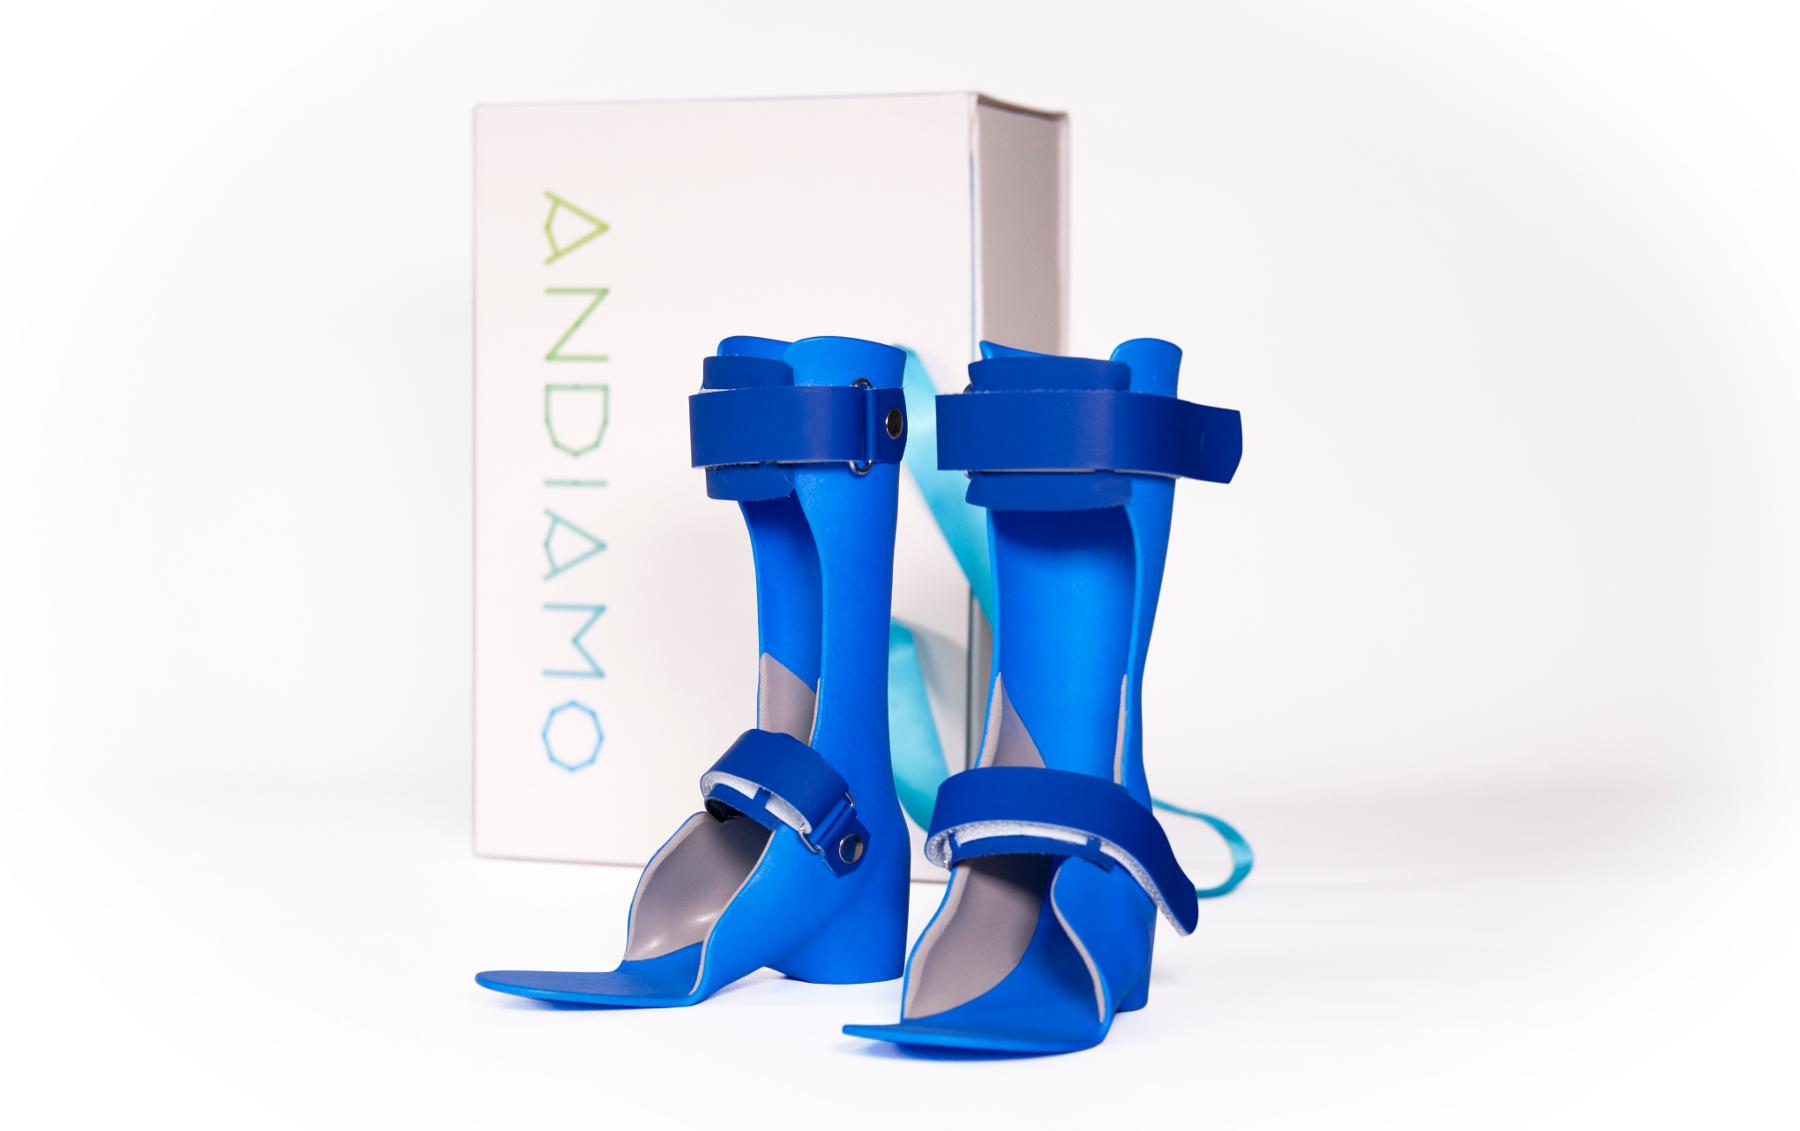 Andiamo 3D printed leg splints